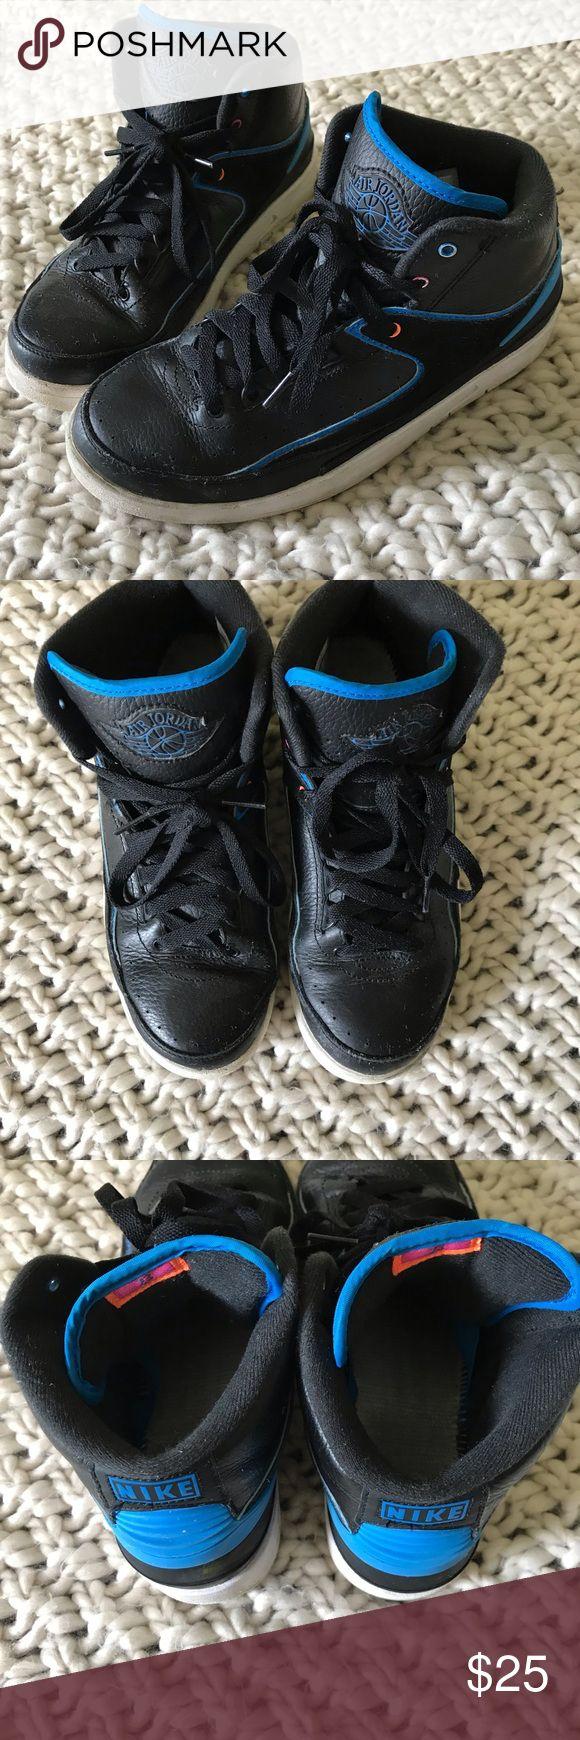 Air Jordan's Youth size 6.5 Air jordans, Jordans, Kids